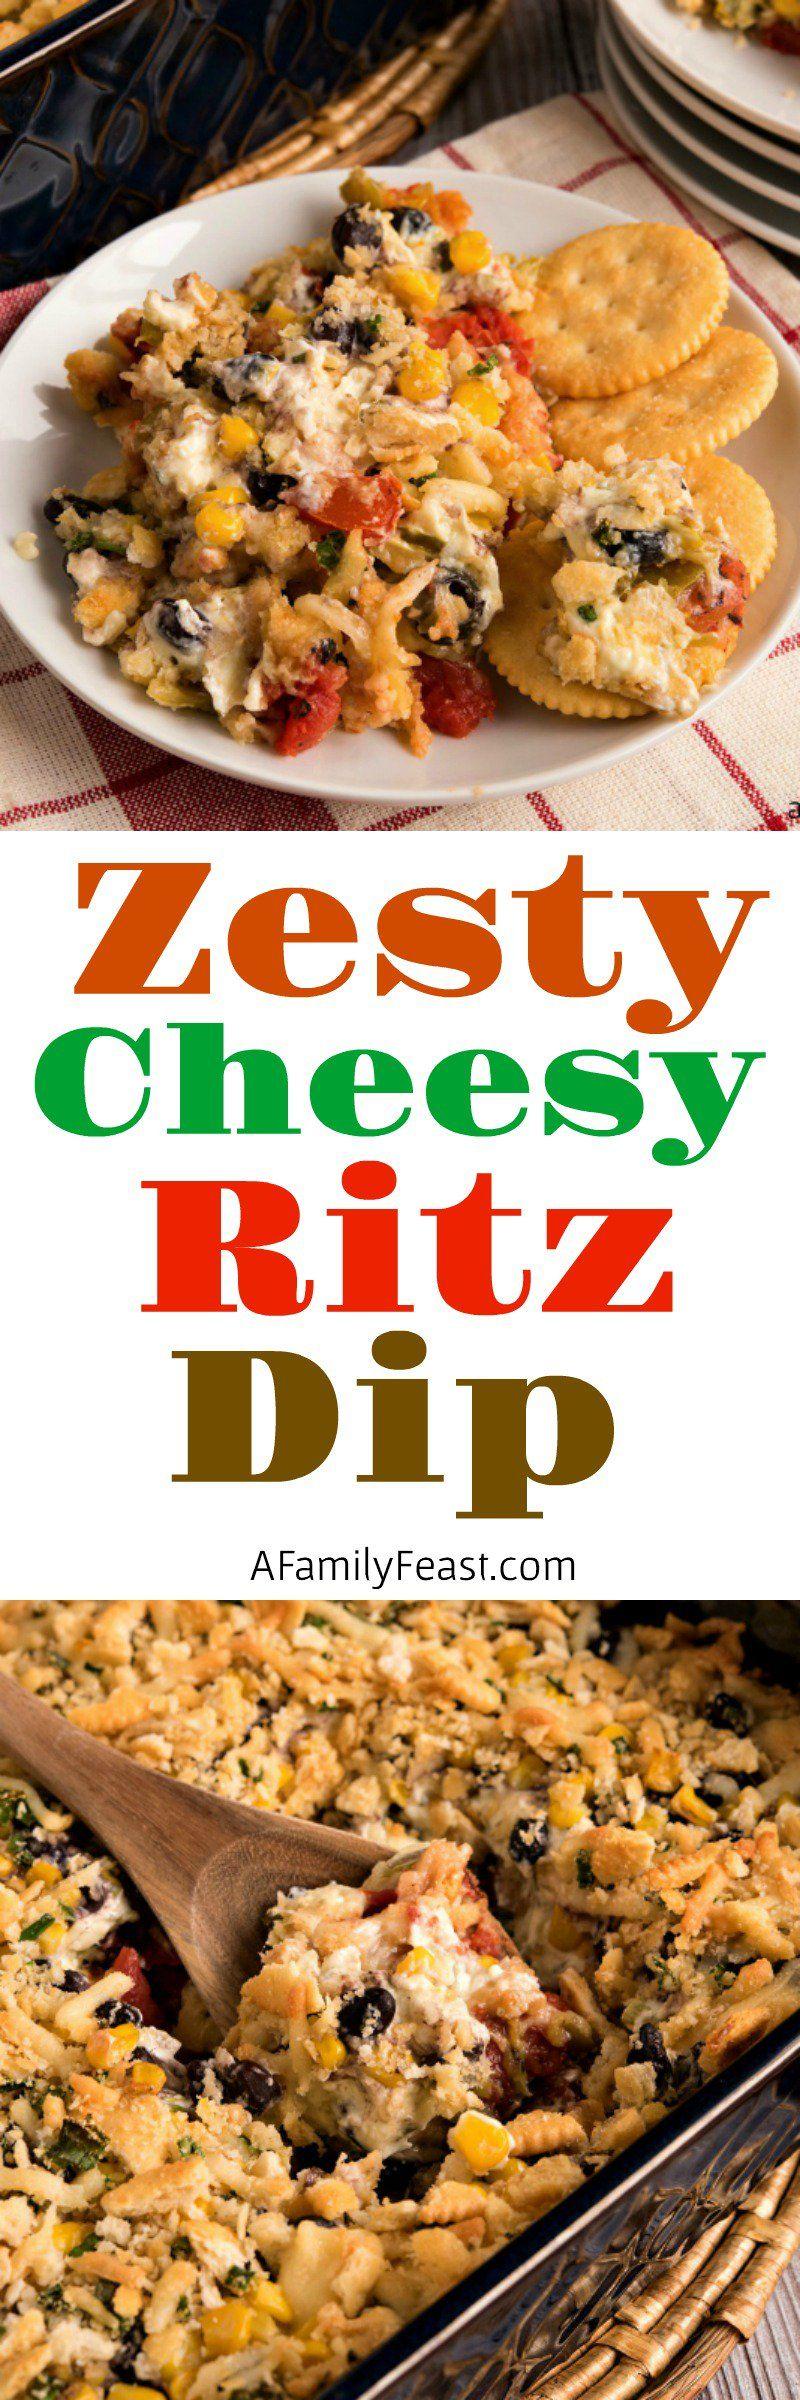 Zesty Cheesy Ritz Dip